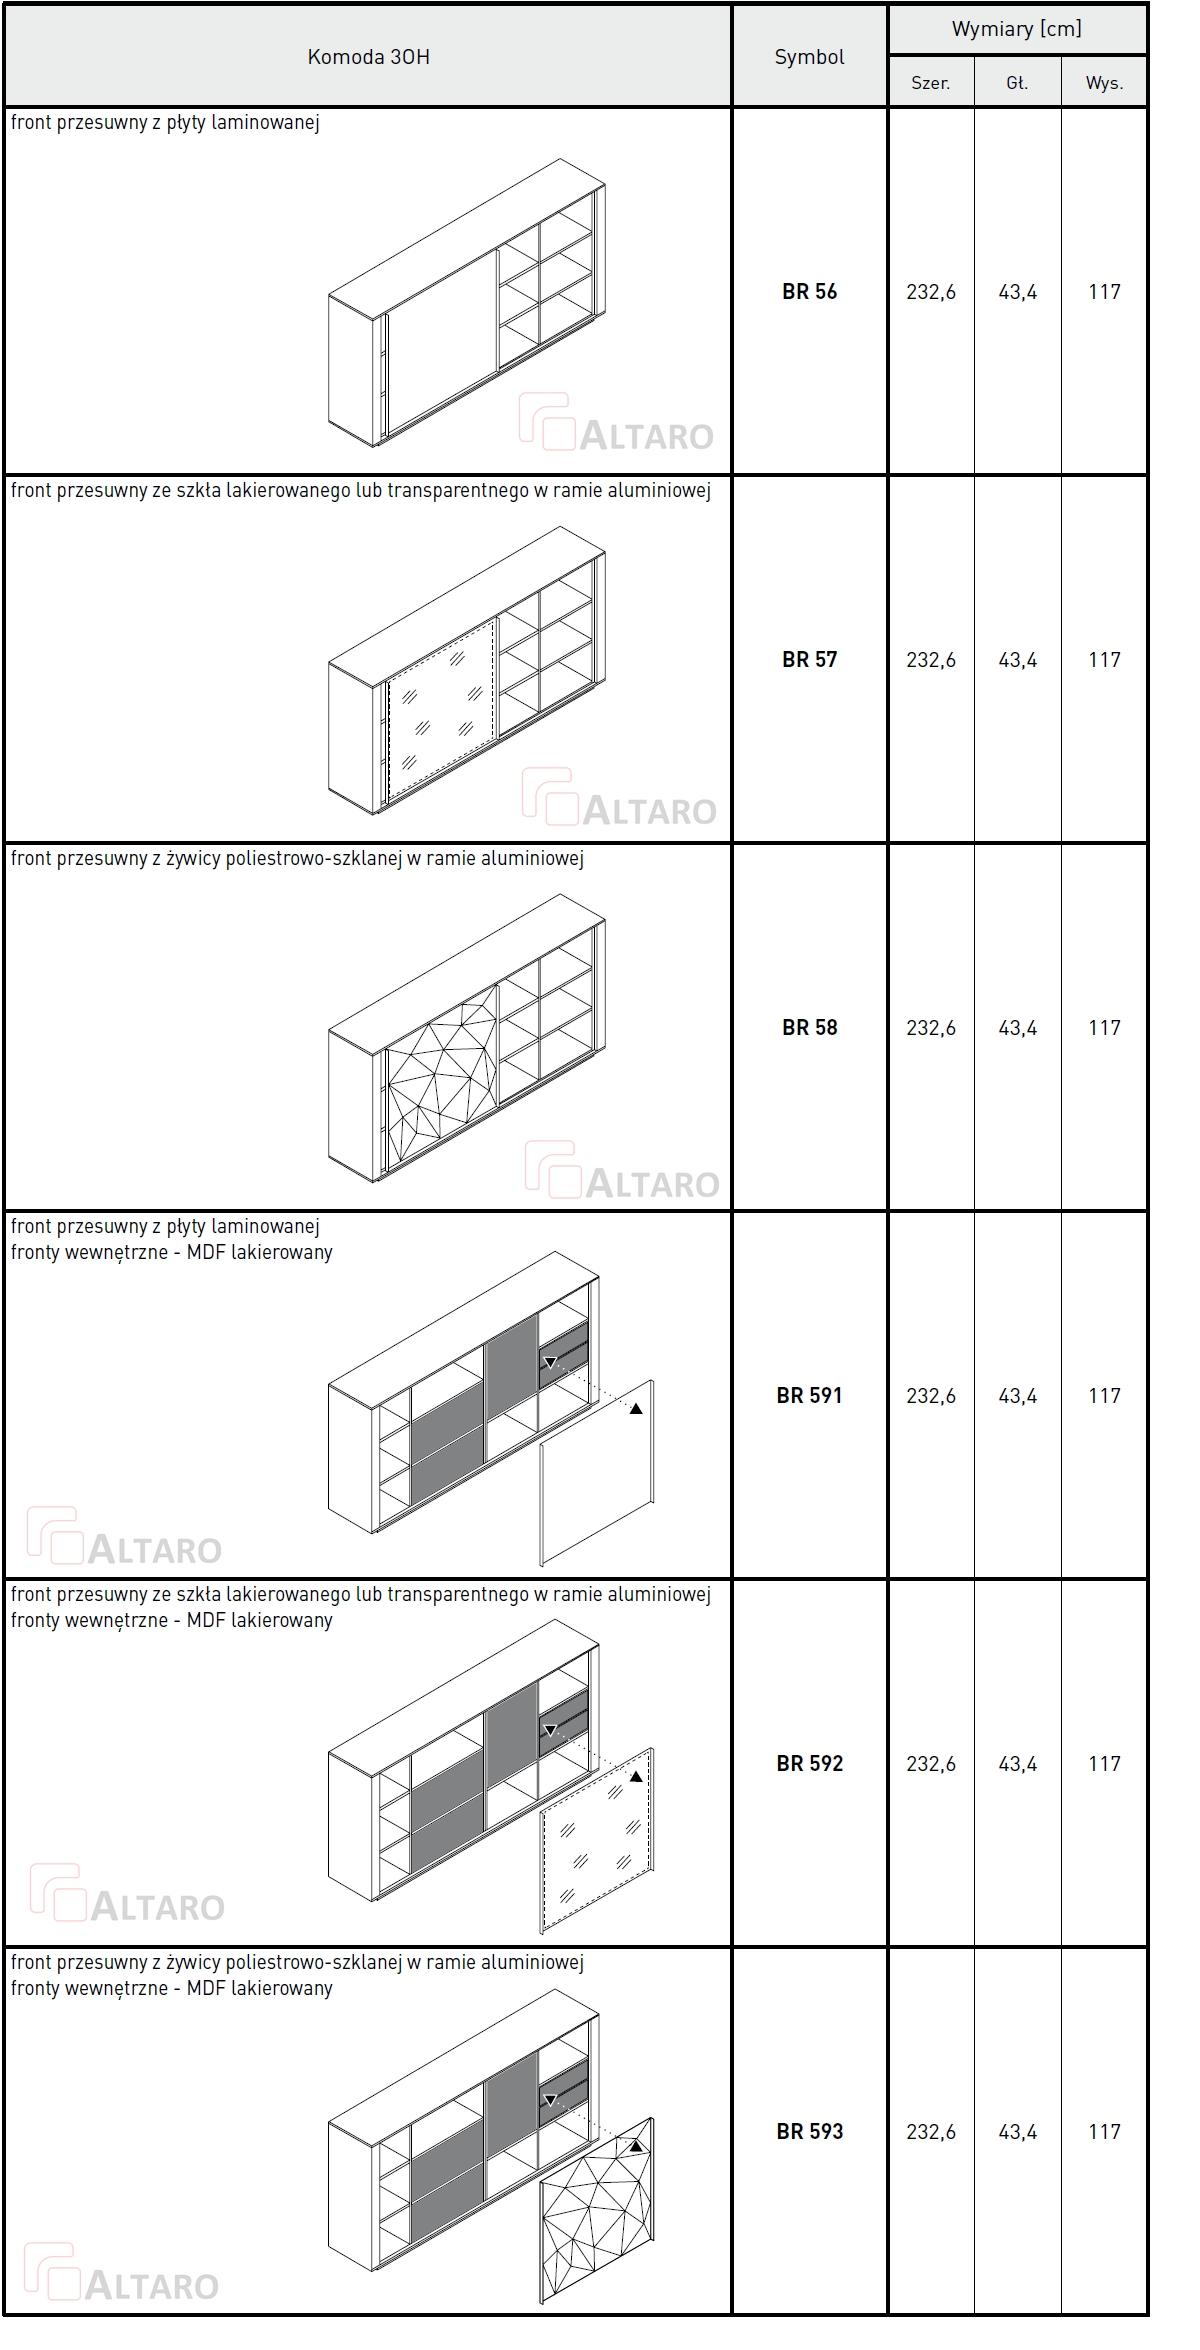 meble gabinetowe BRAND katalog v9 ALTARO